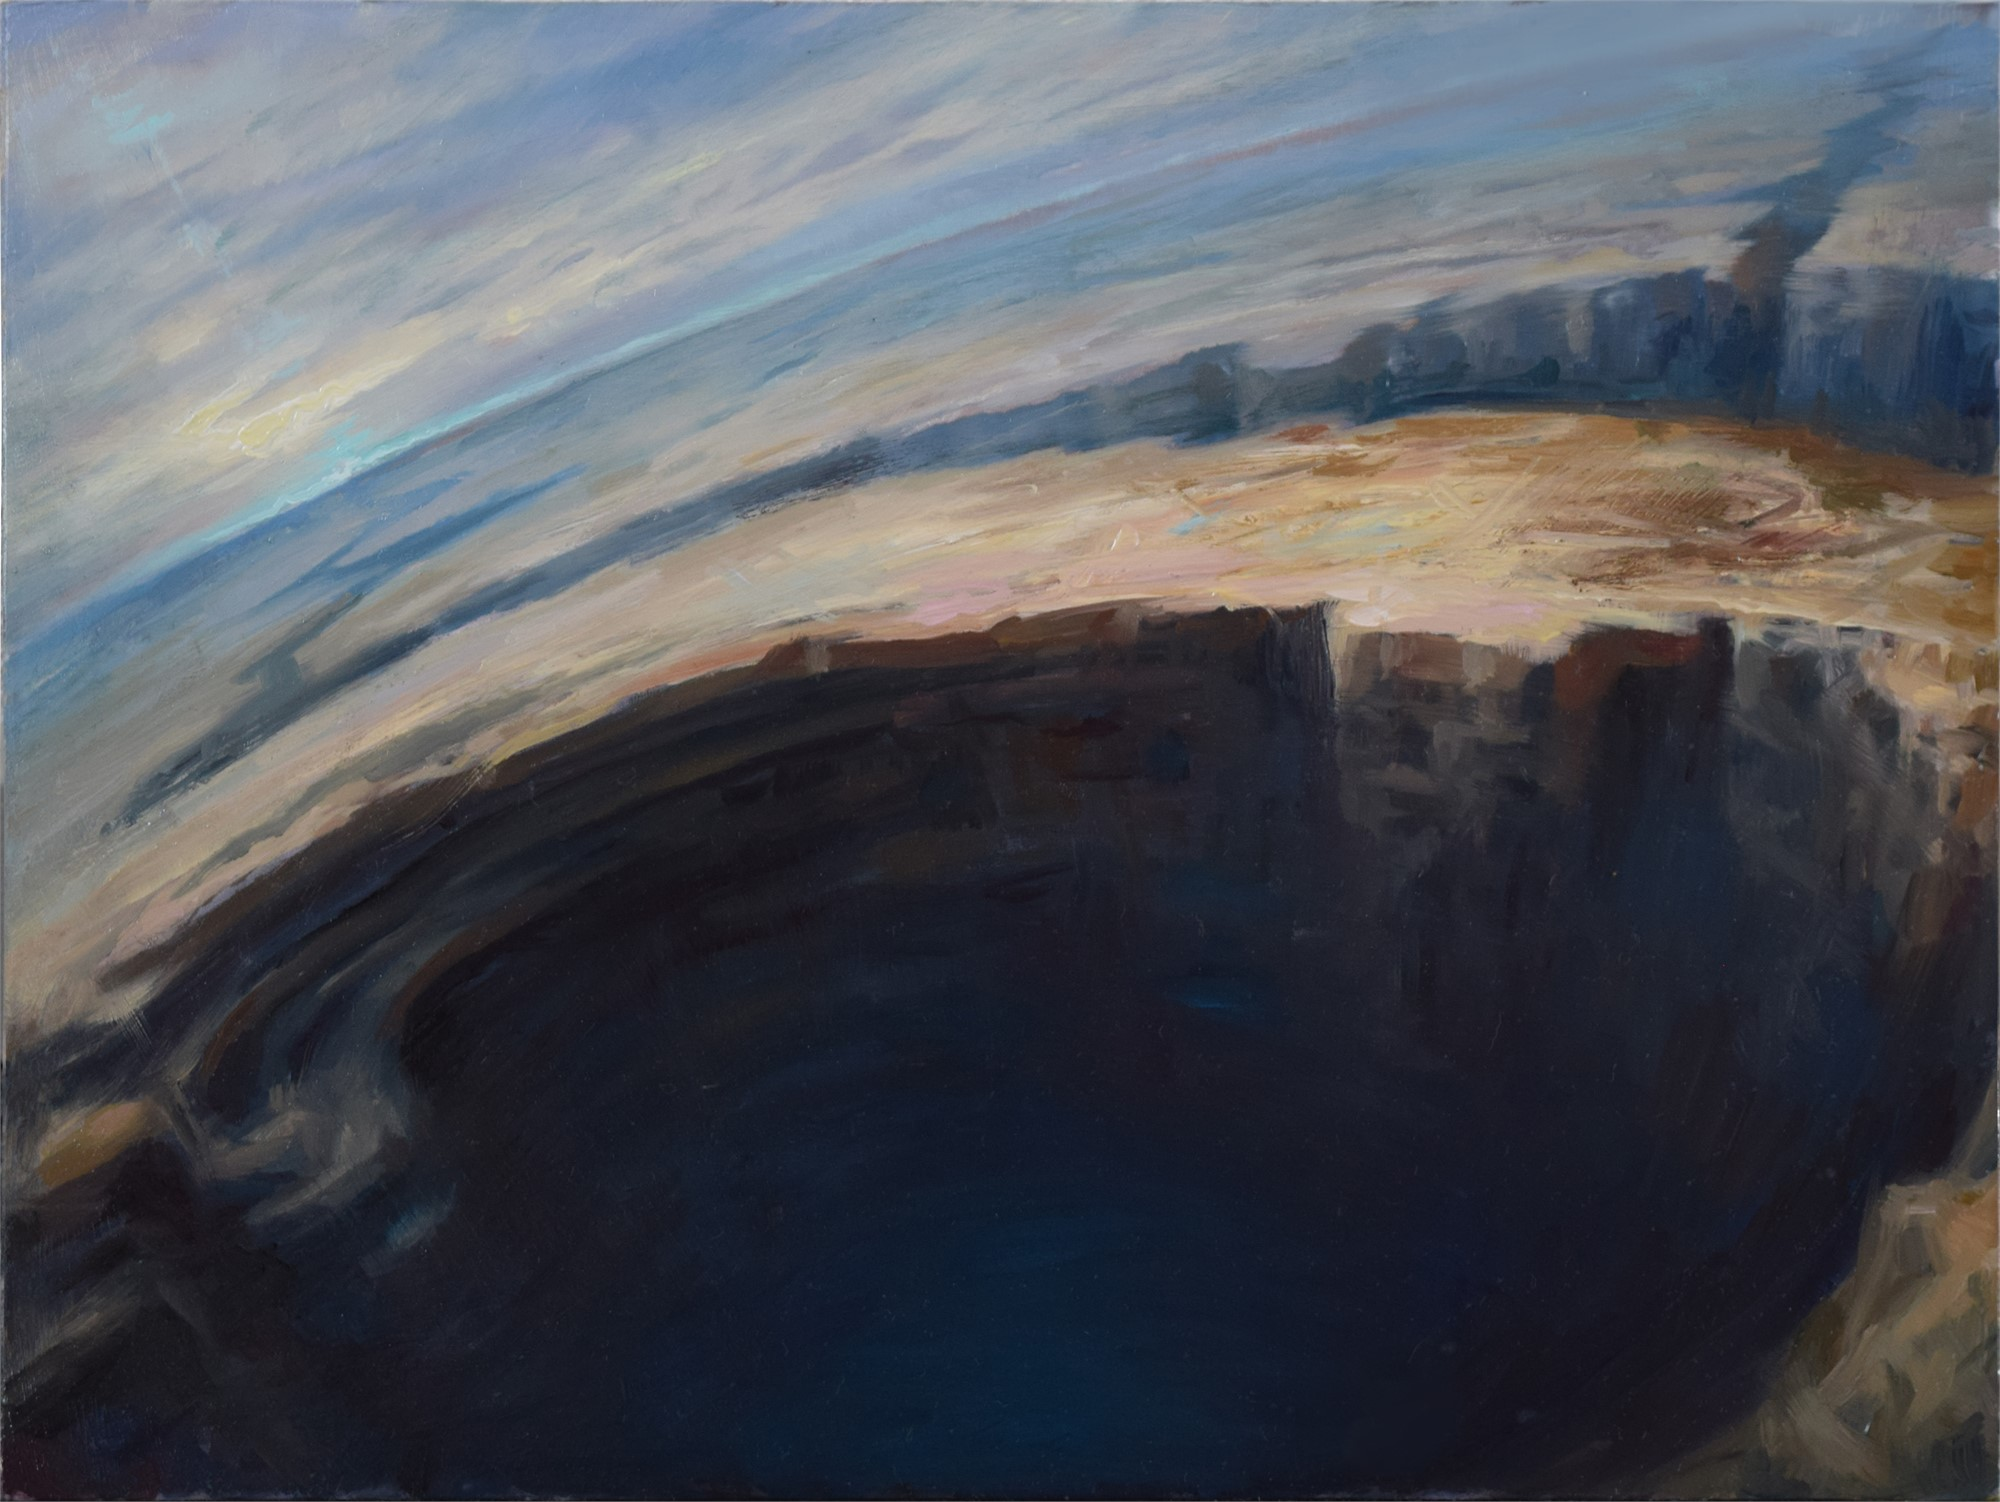 Basin by Tenaya Sims